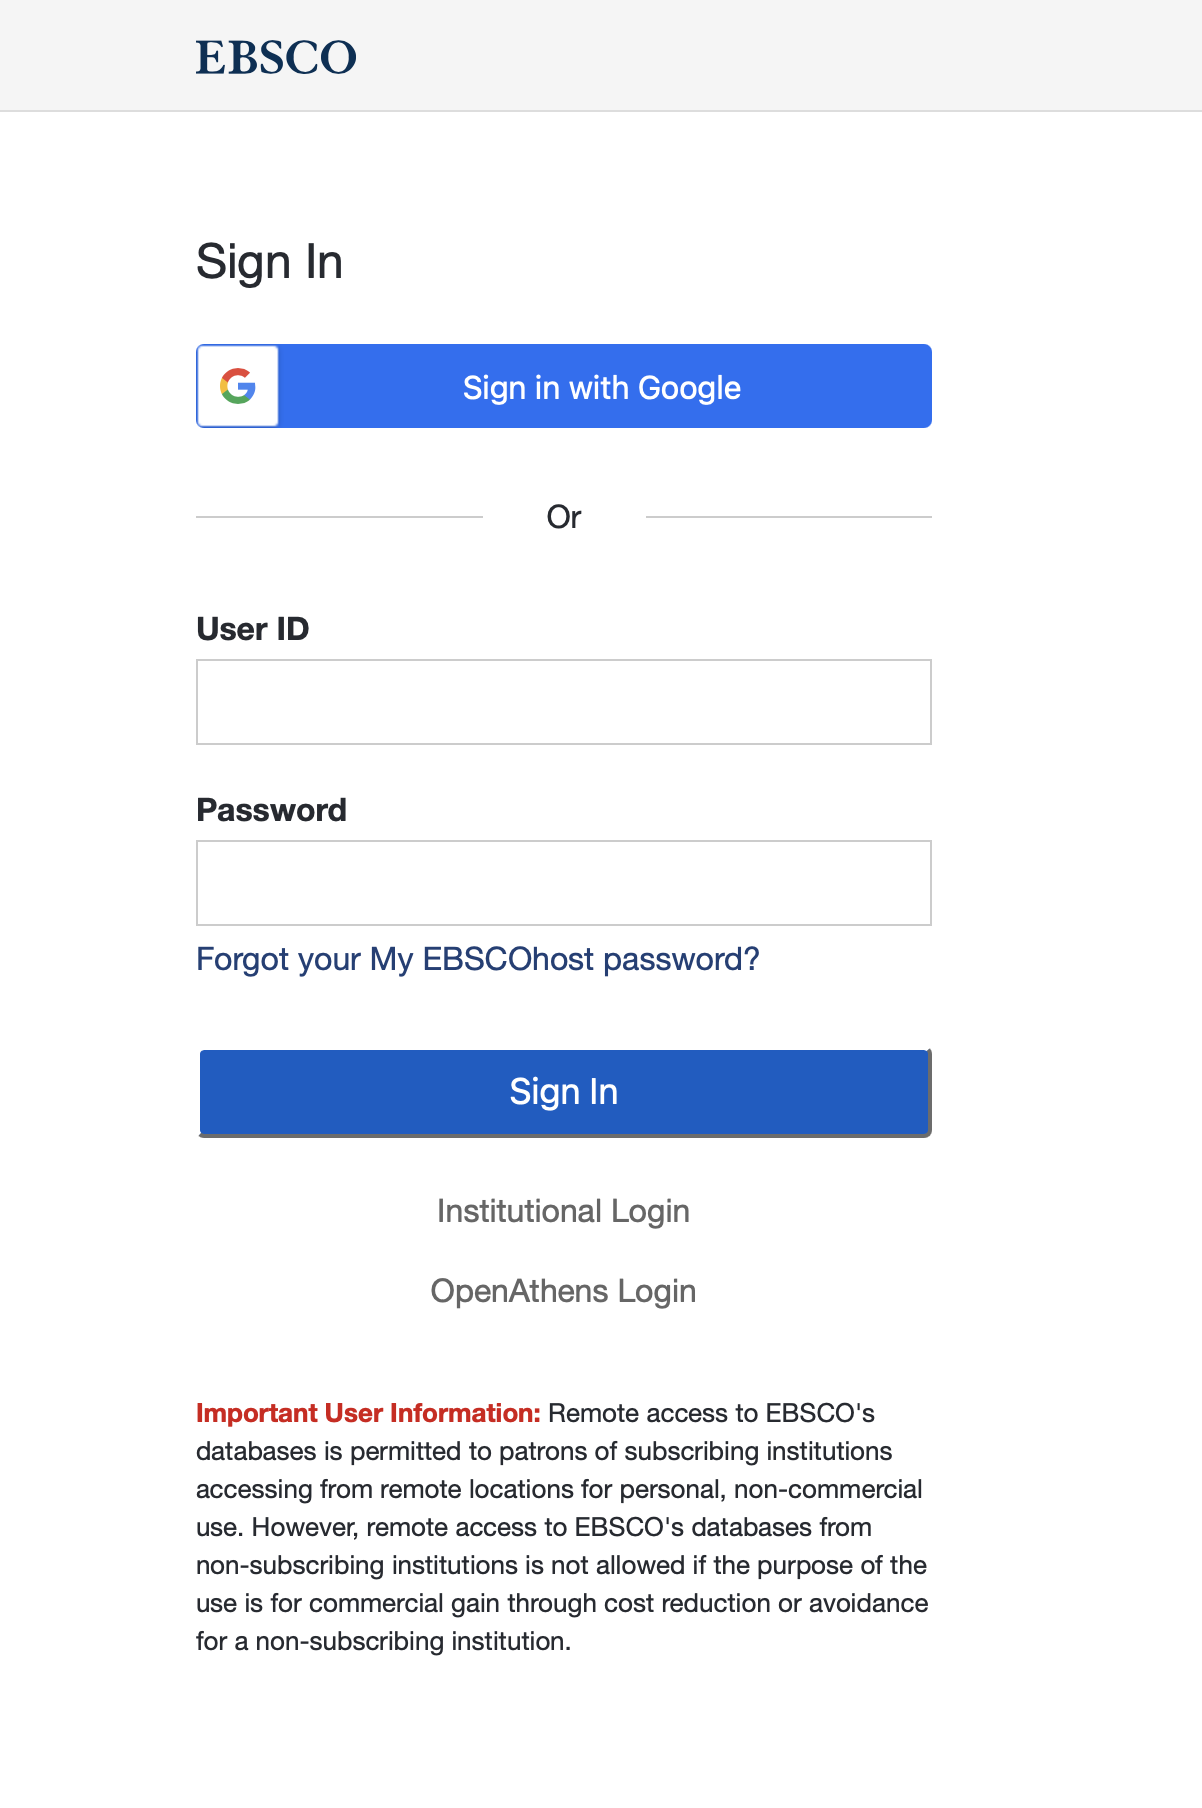 Screenshot of EBSCO sign-in gateway